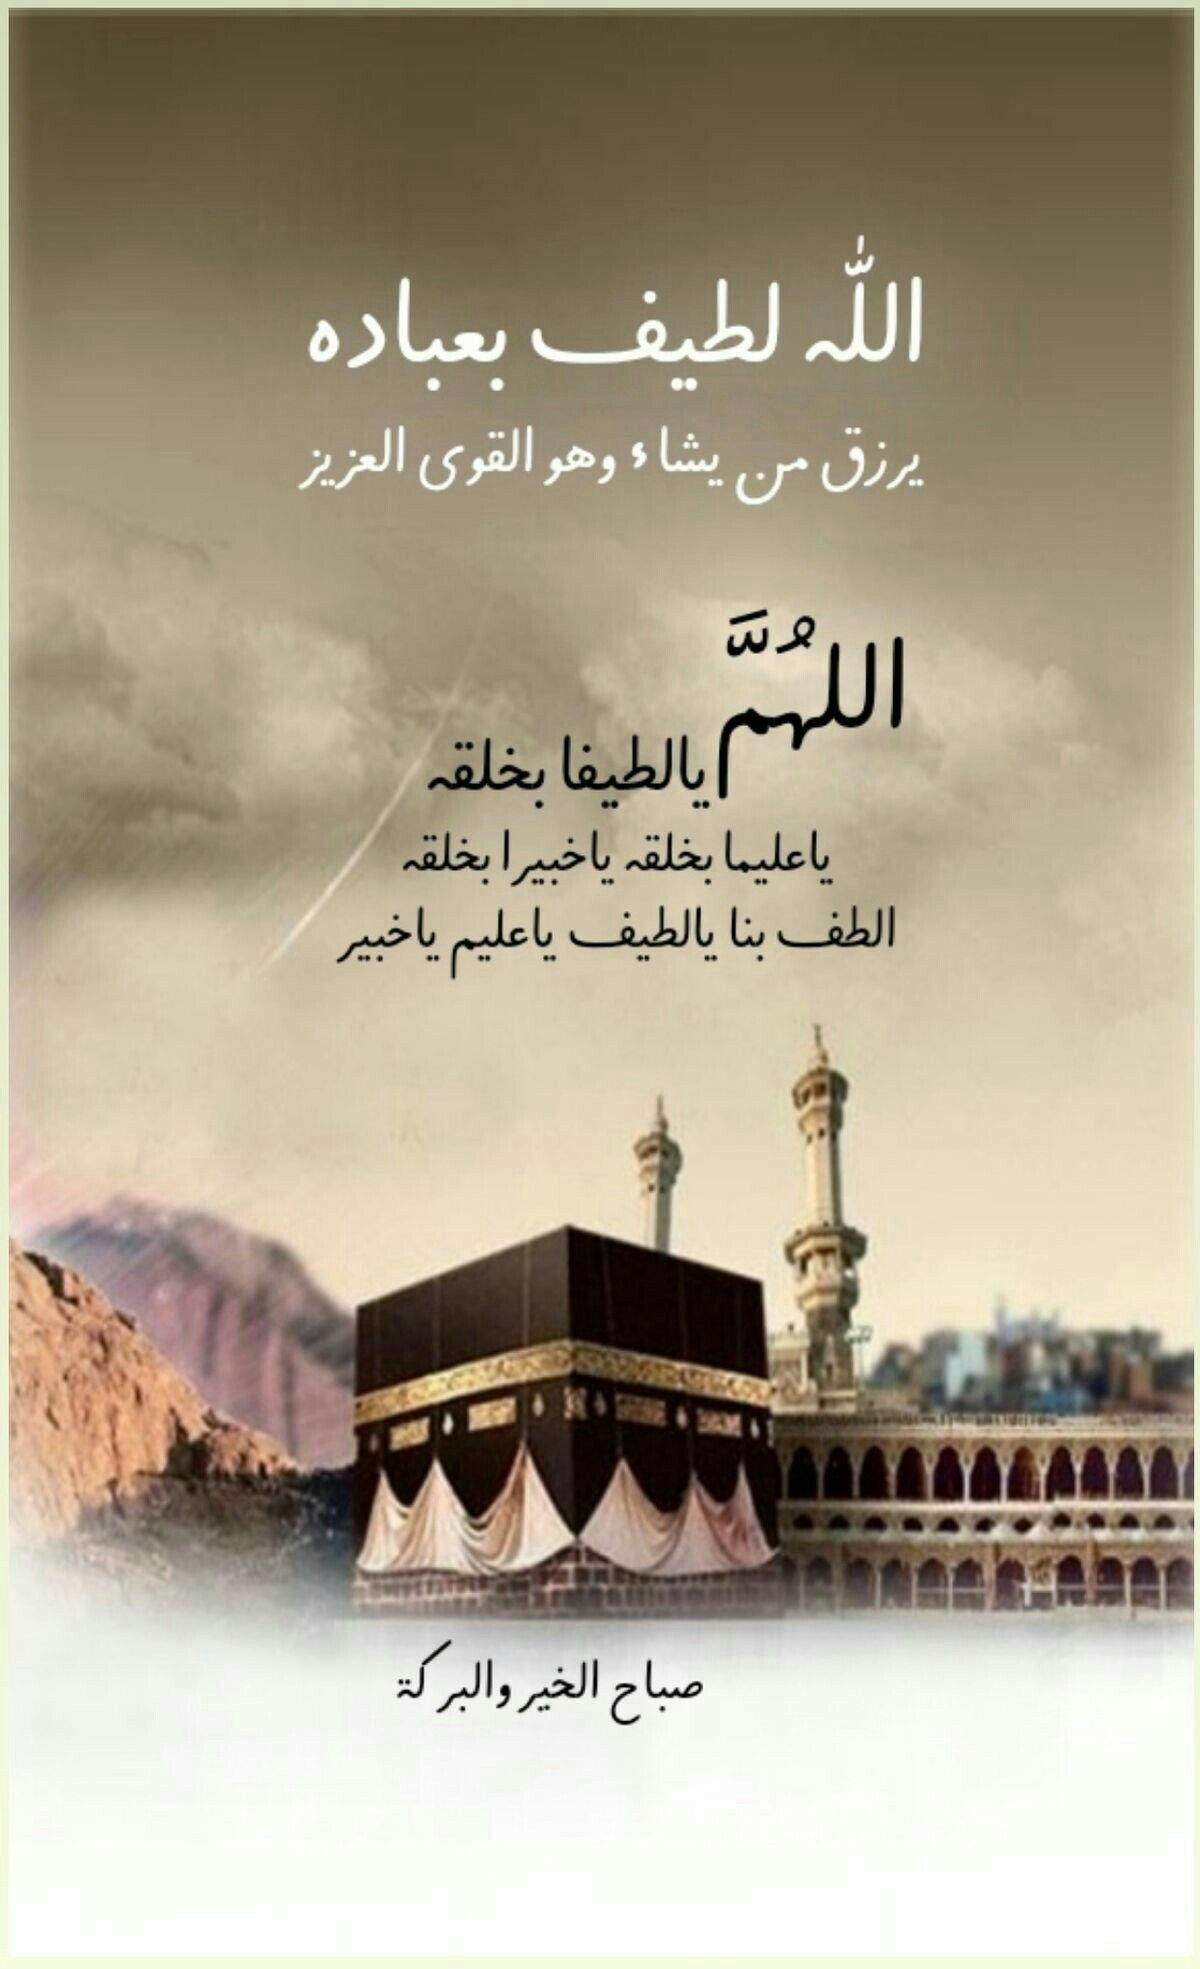 Pin By Amr Saqr On صباح الخير Good Morning Good Morning Arabic Good Morning Greetings Good Morning Quotes